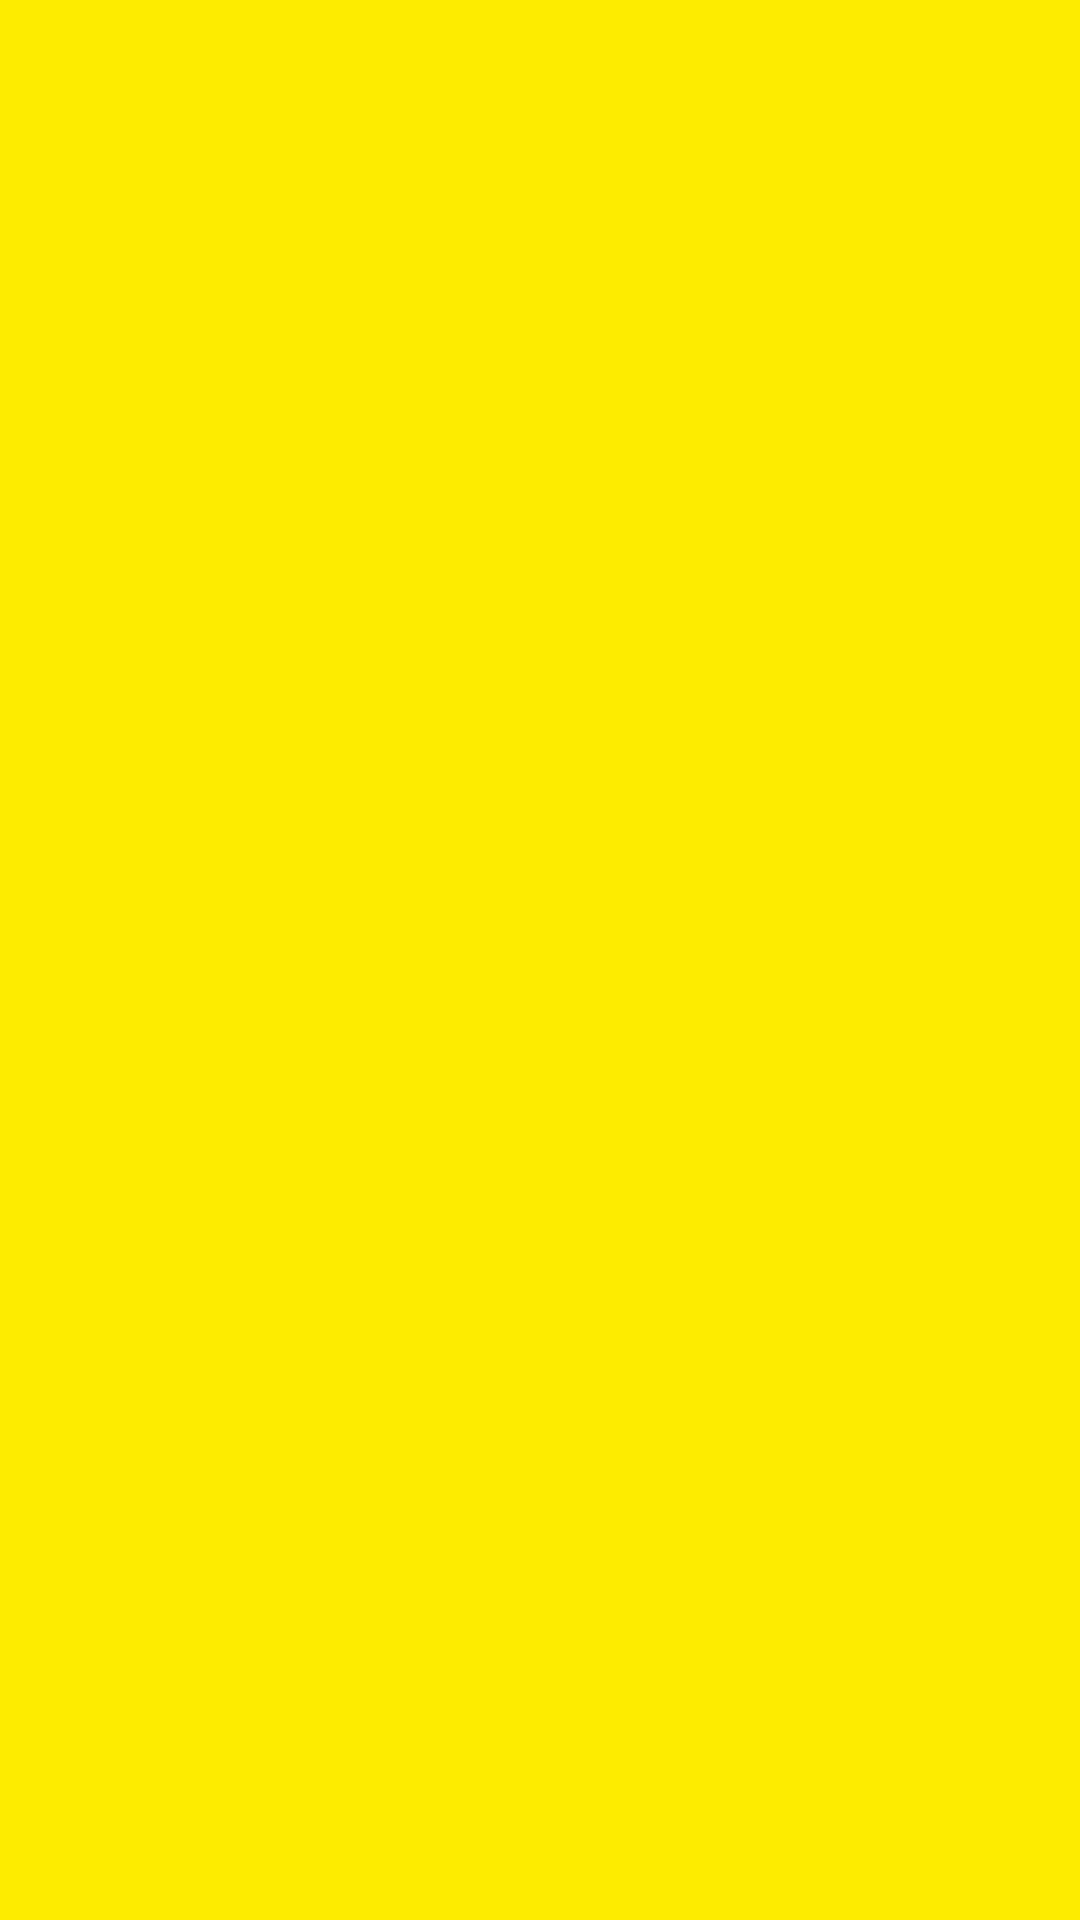 1080x1920 Aureolin Solid Color Background